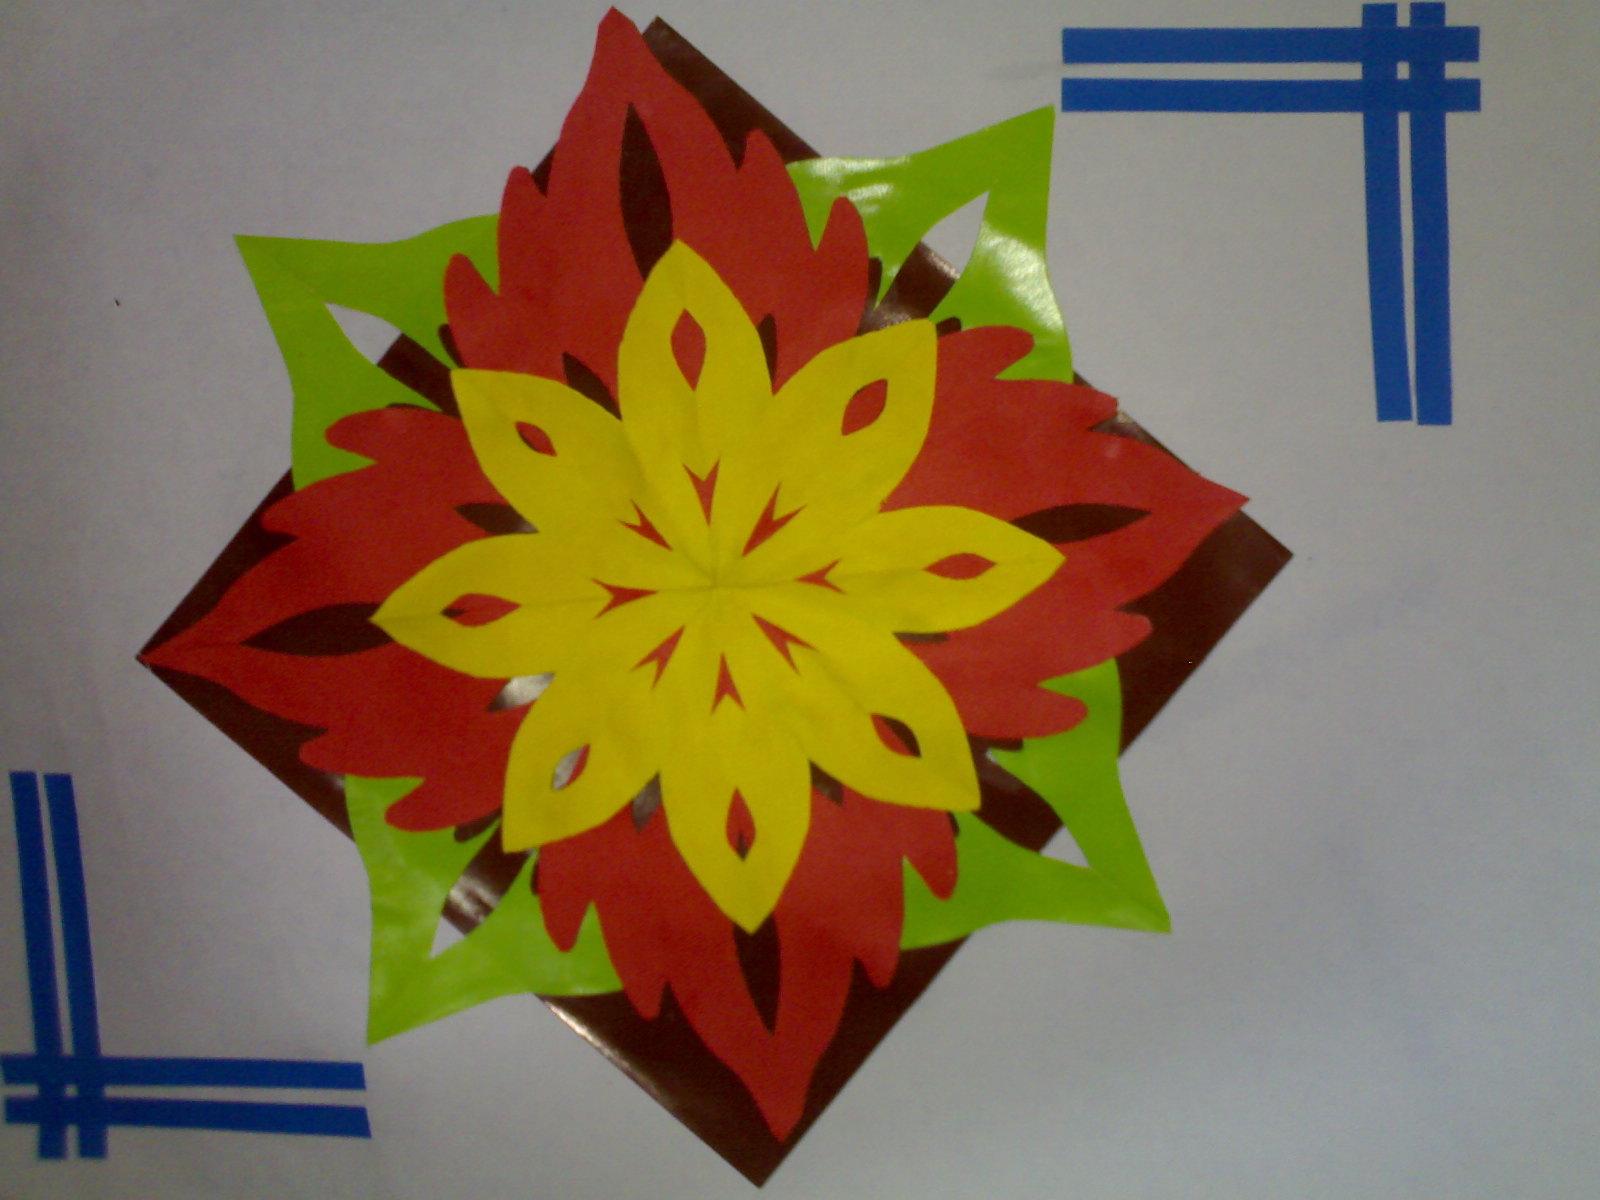 Karya Seni Rupa Pgsd 4e Ikip Pgri Madiun Ndotz 17